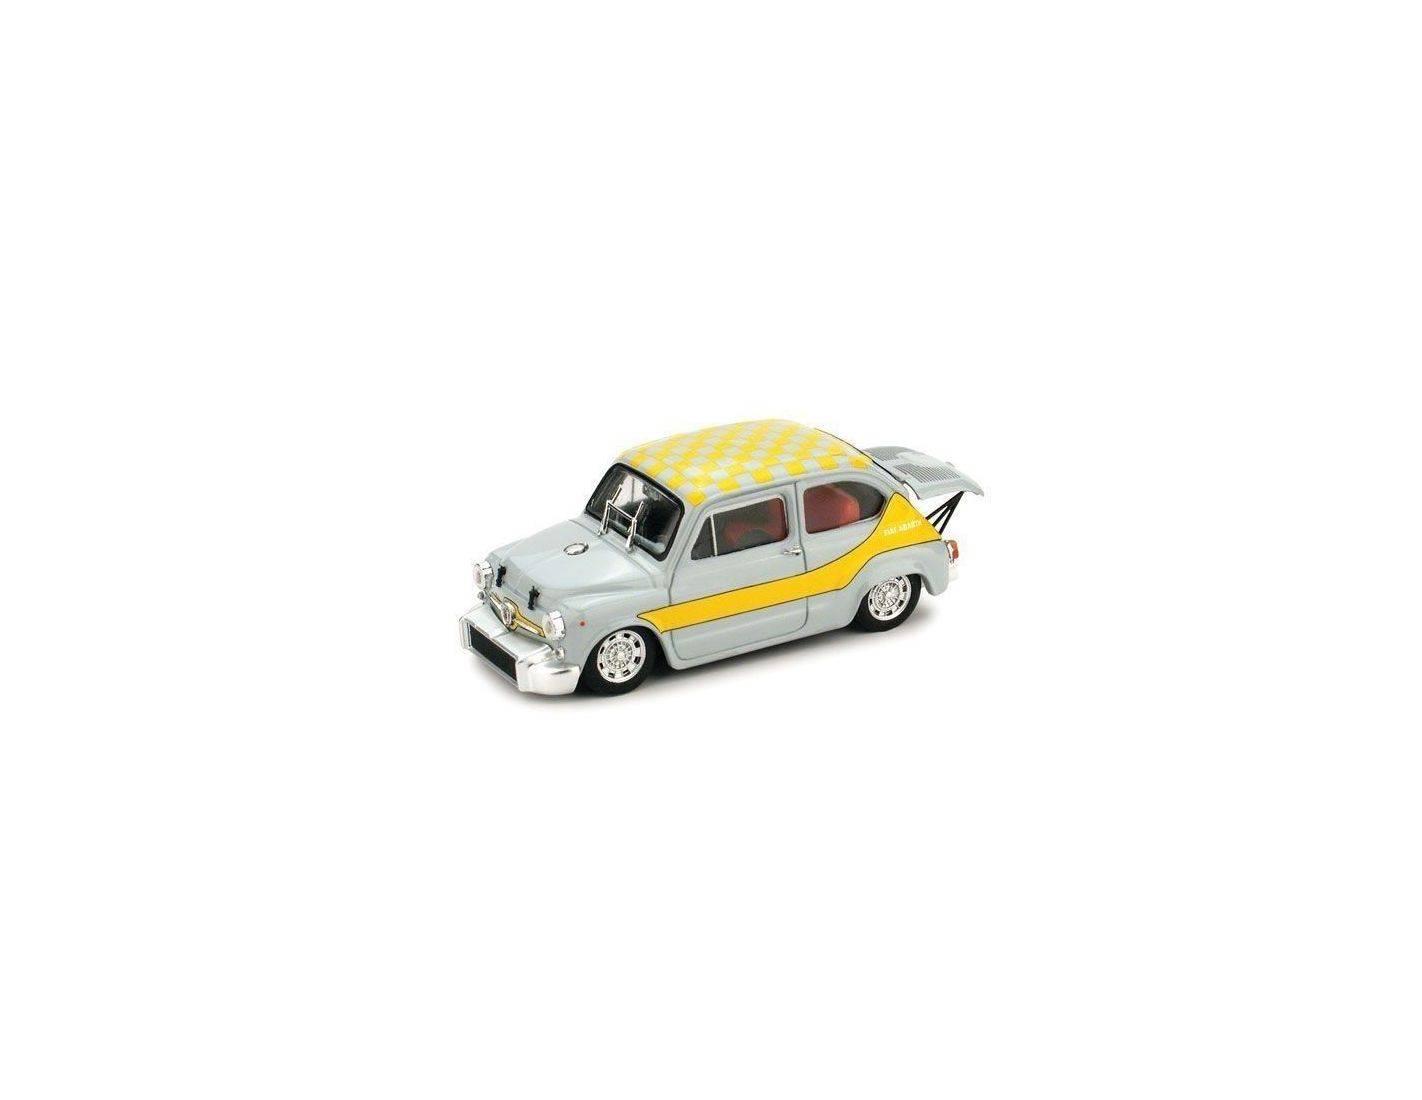 Brumm R380-03 FIAT ABARTH 1000 BERLINA 1/43 Modellino